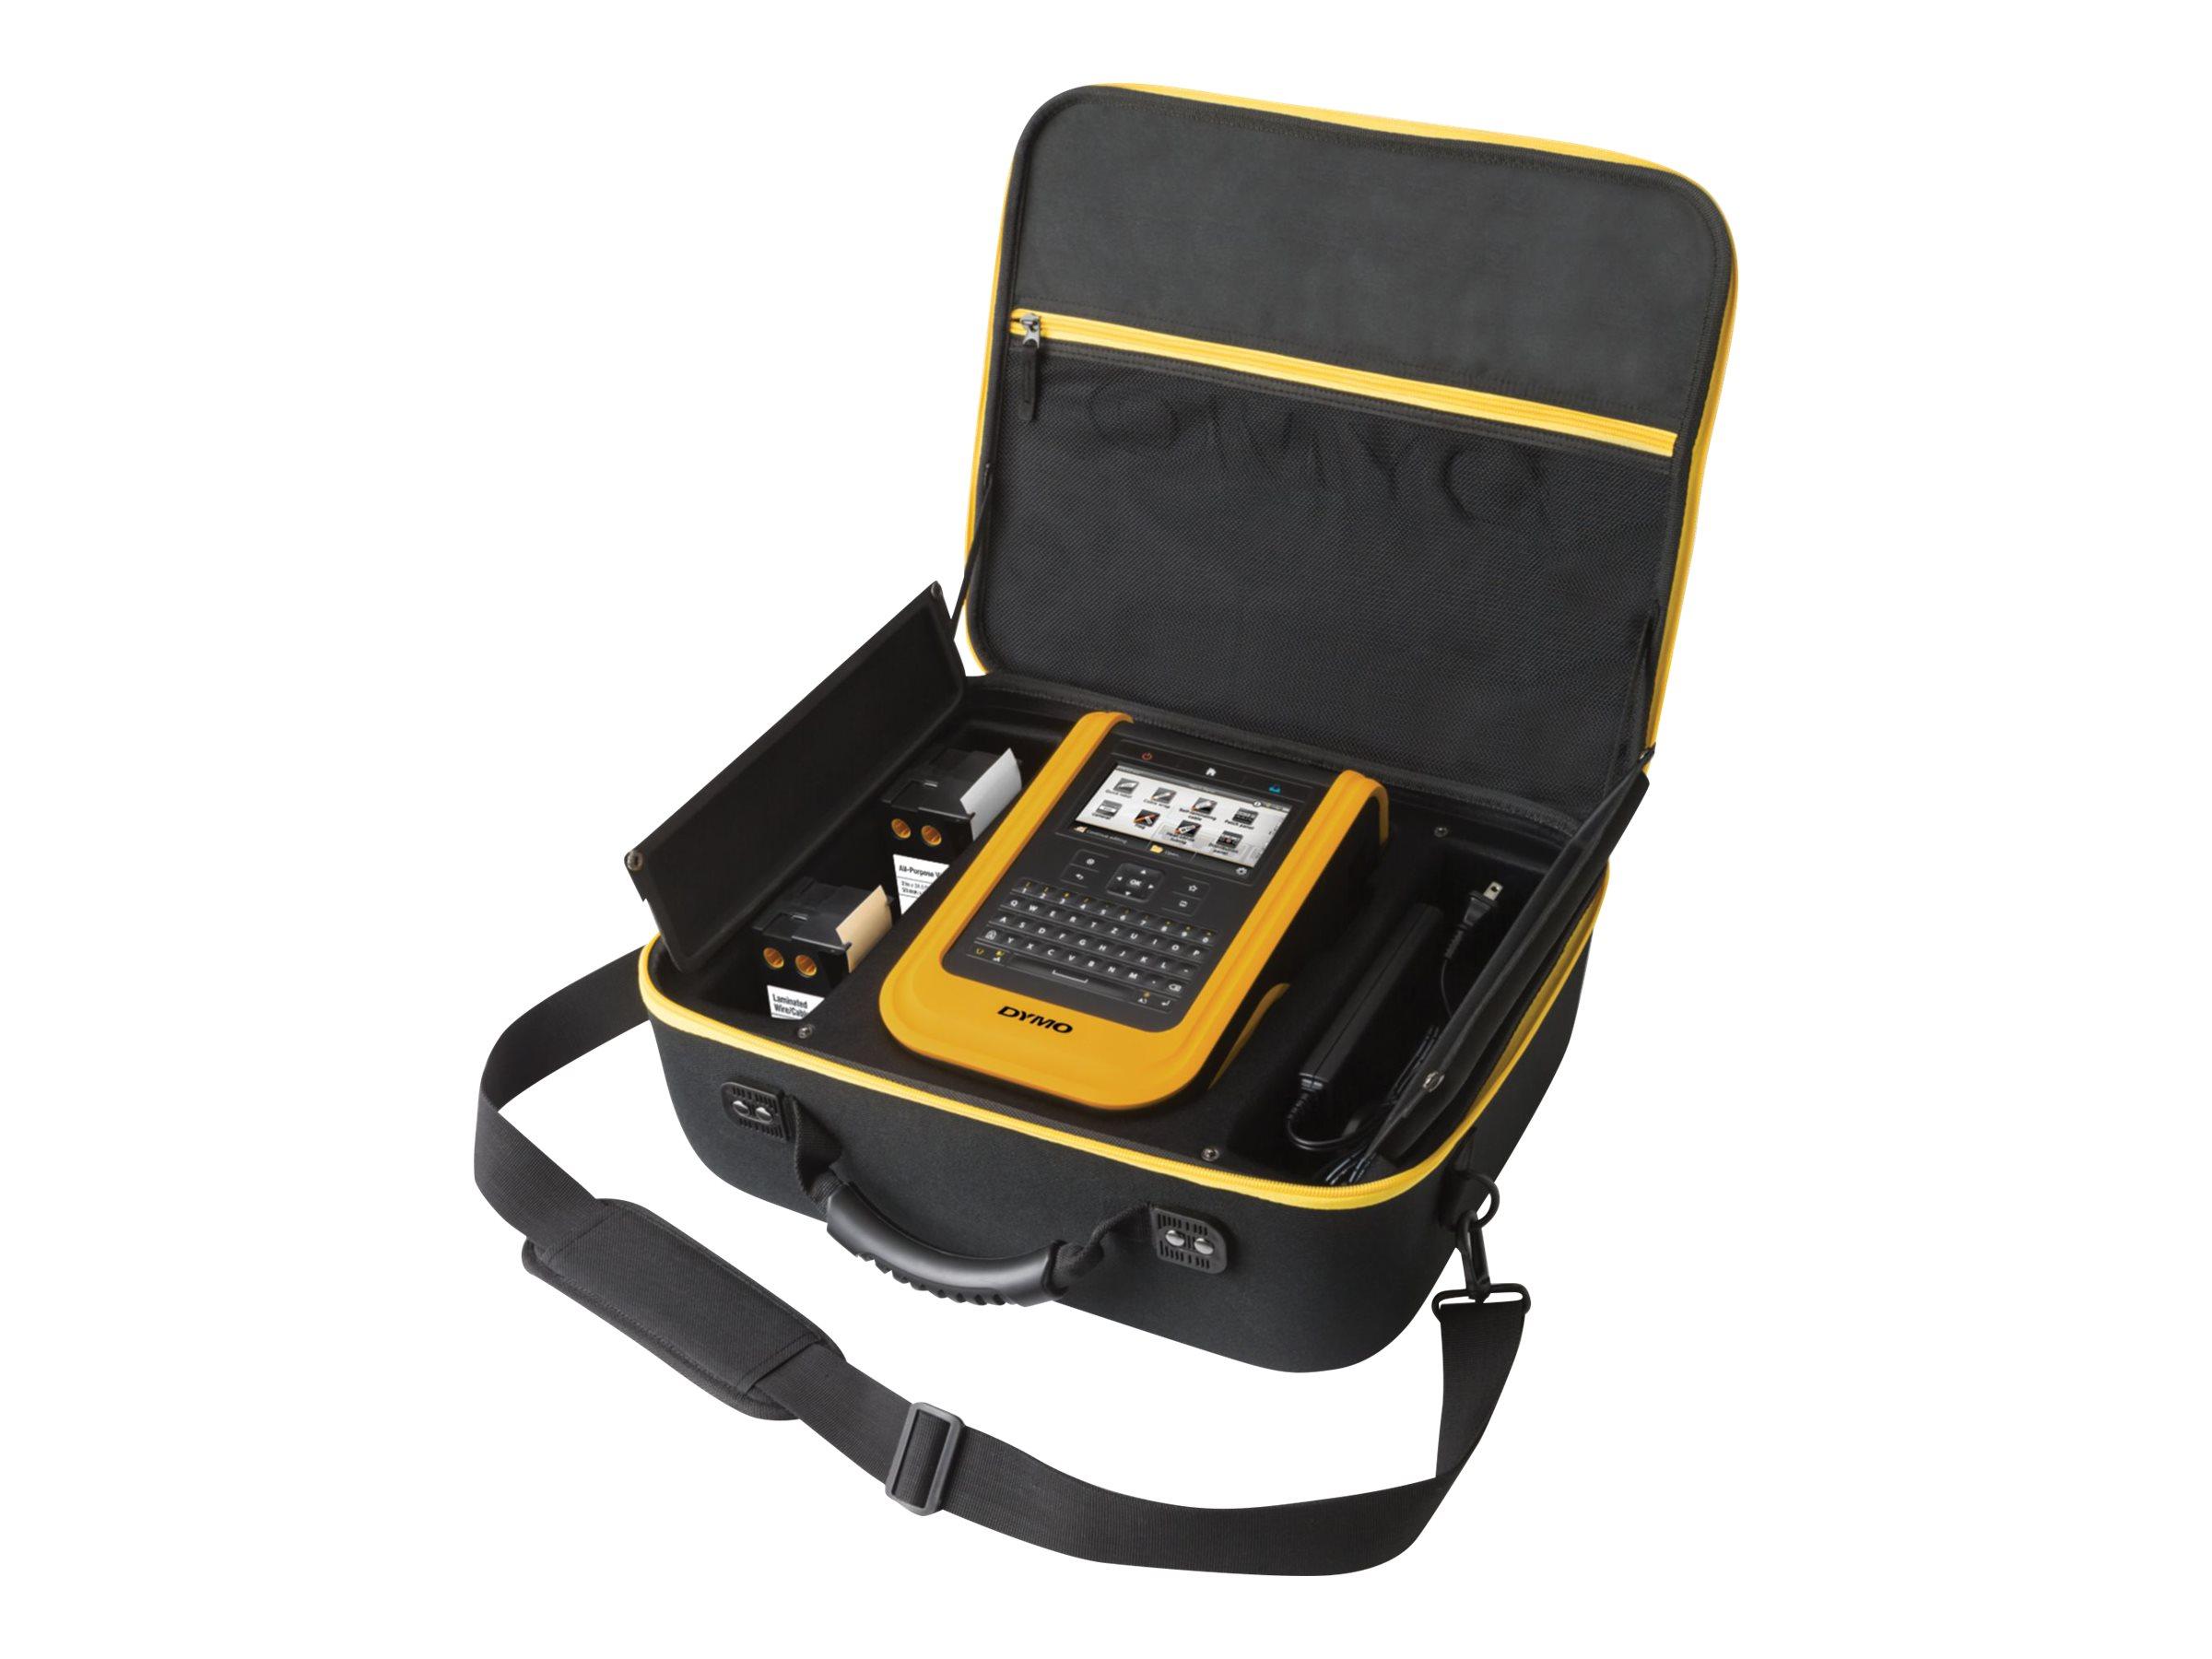 DYMO XTL 500 - Kit - Beschriftungsgerät - s/w - Thermotransfer - Rolle (5,4 cm)